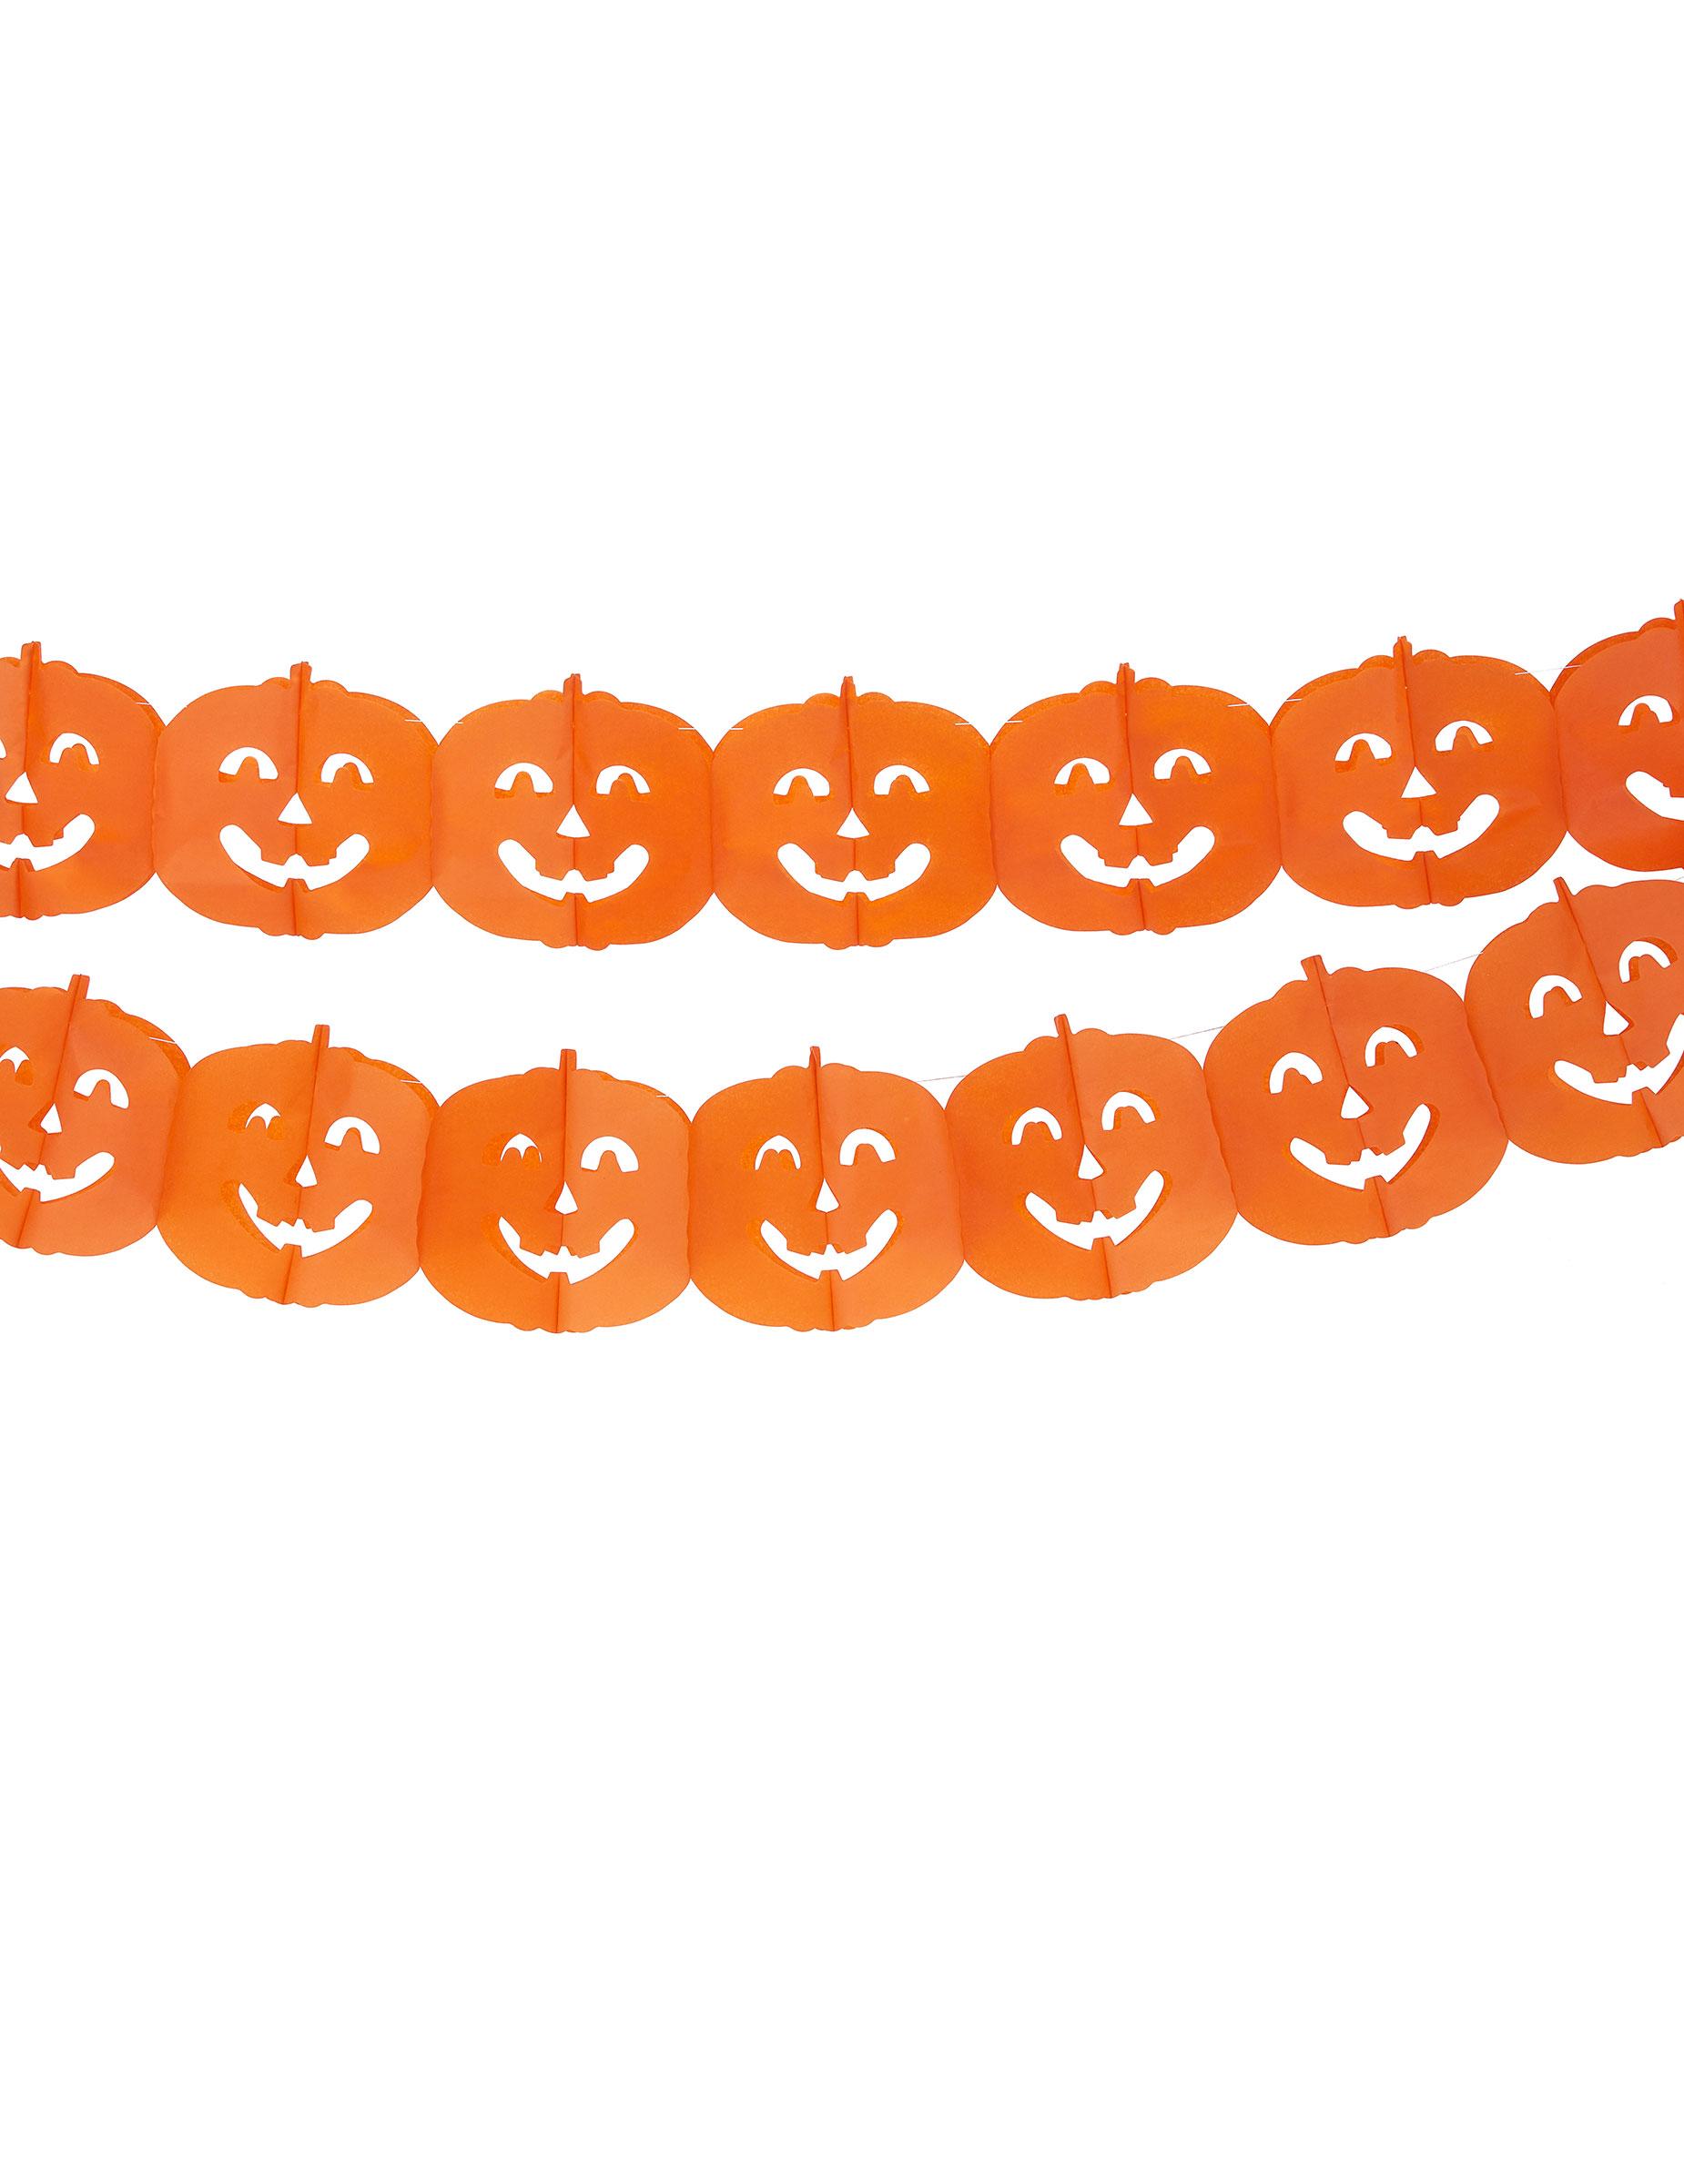 Guirlande citrouille halloween deguise toi achat de decoration animation - Guirlande halloween a imprimer ...